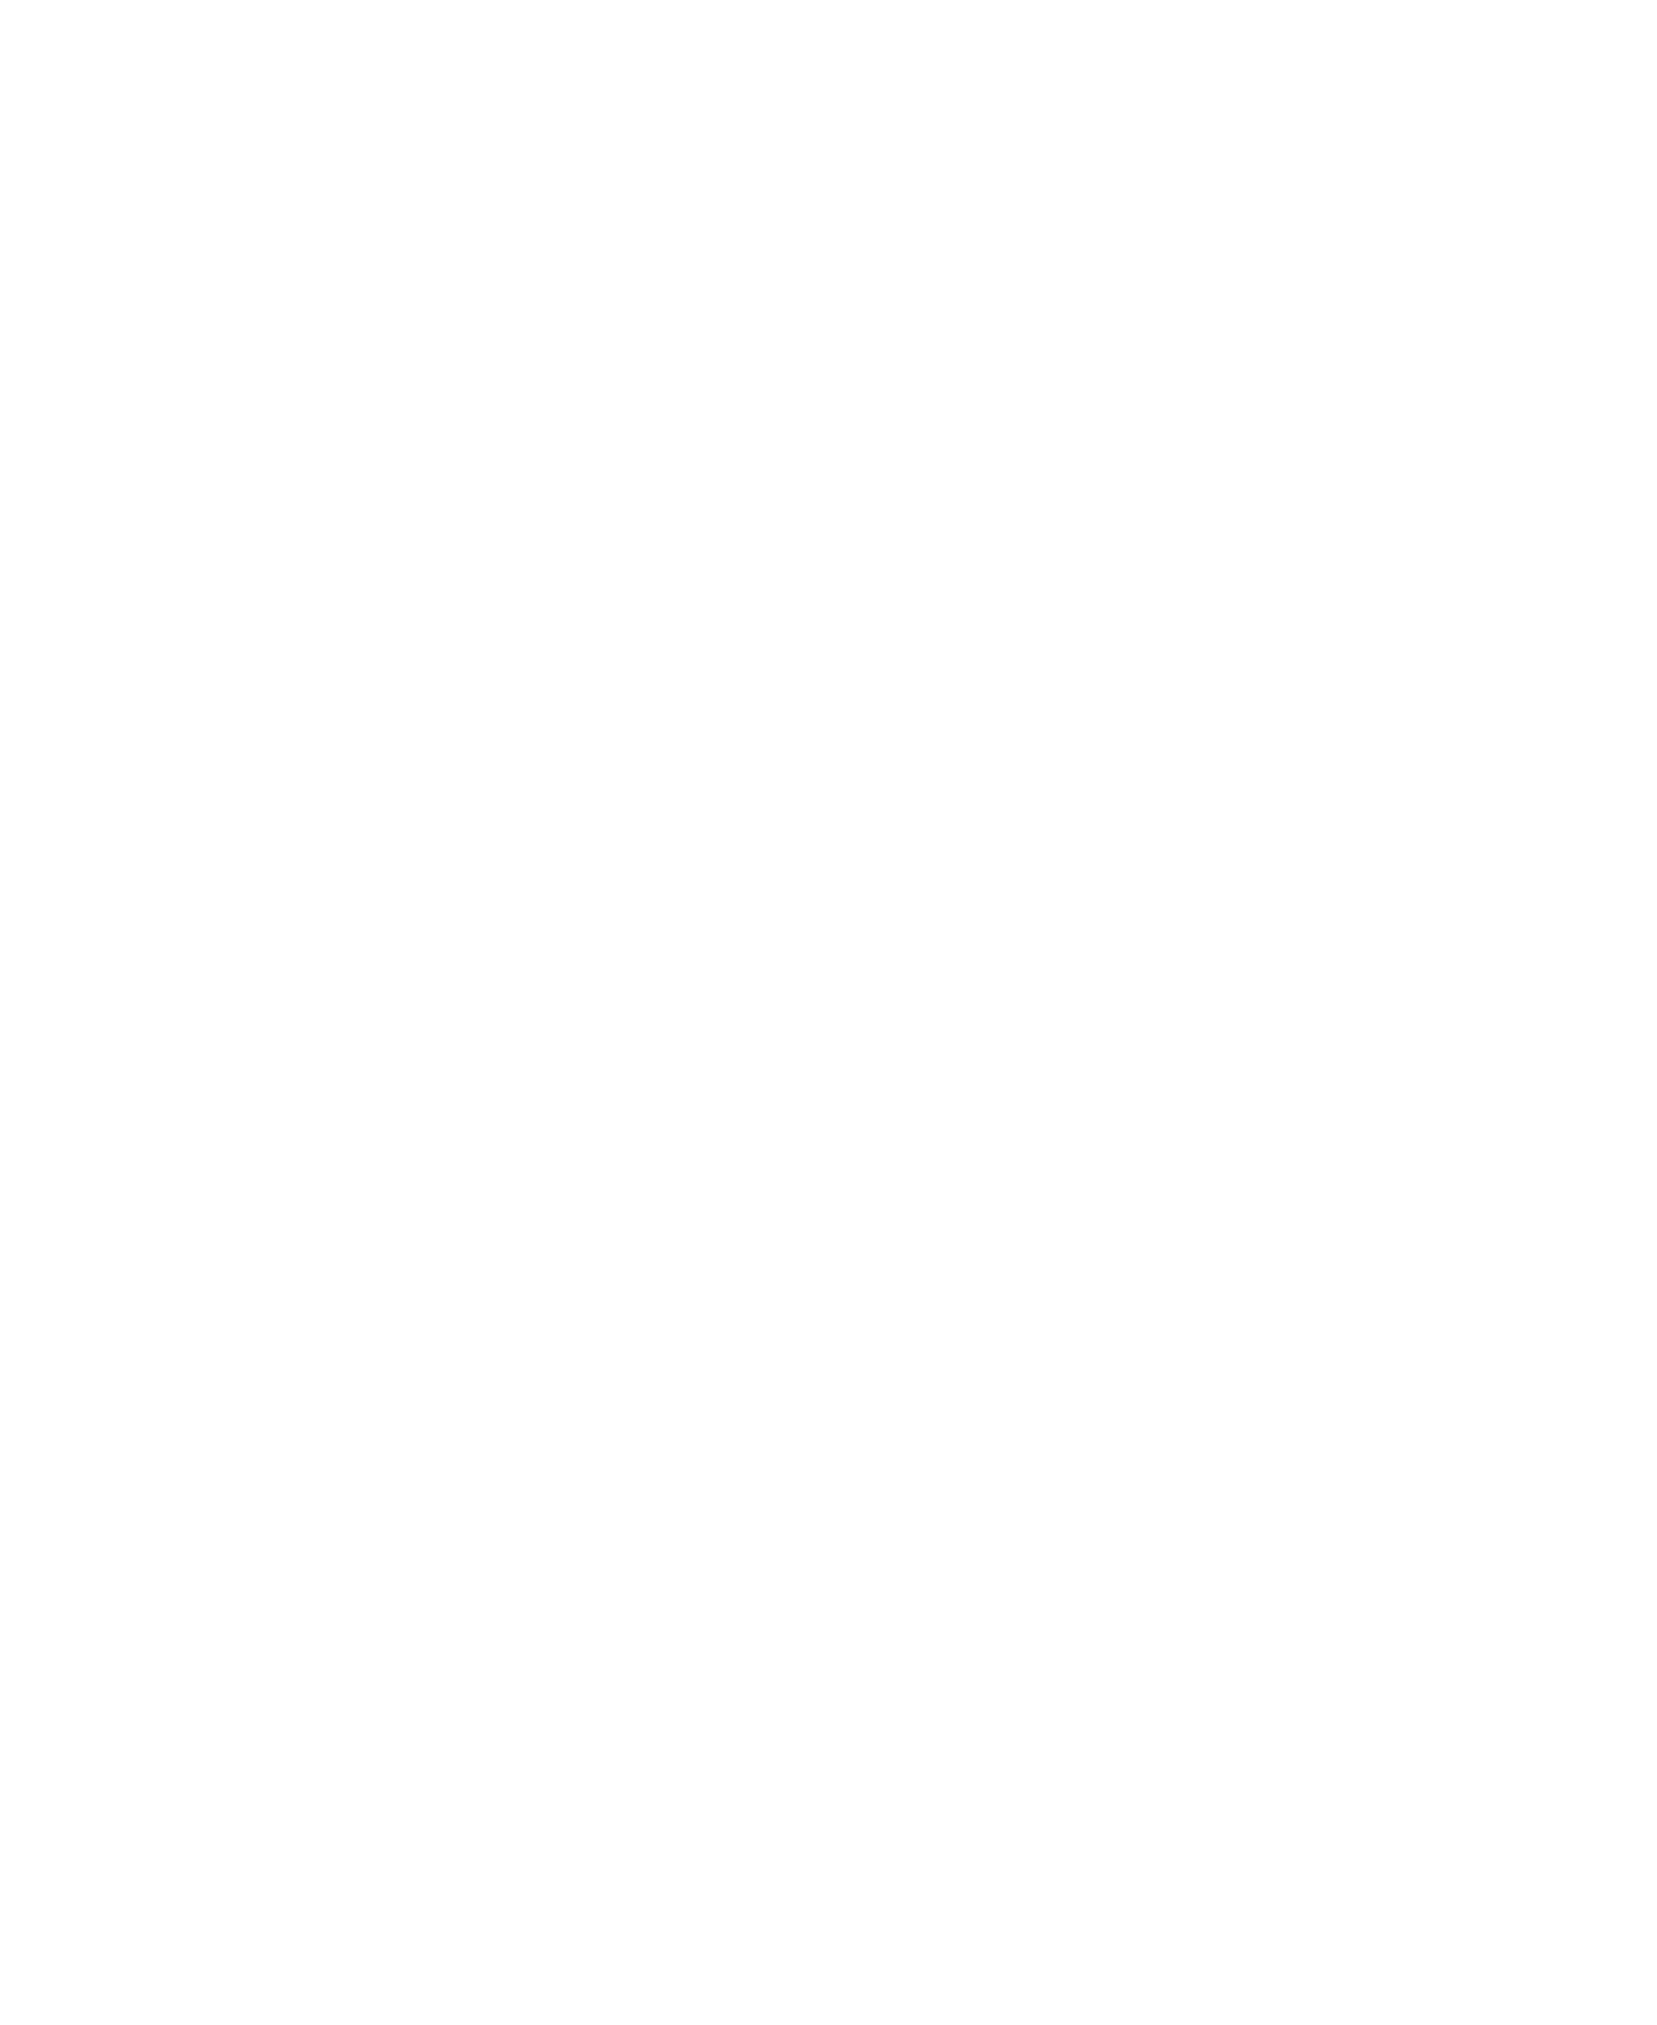 Logo Minimal Raps Aestetics